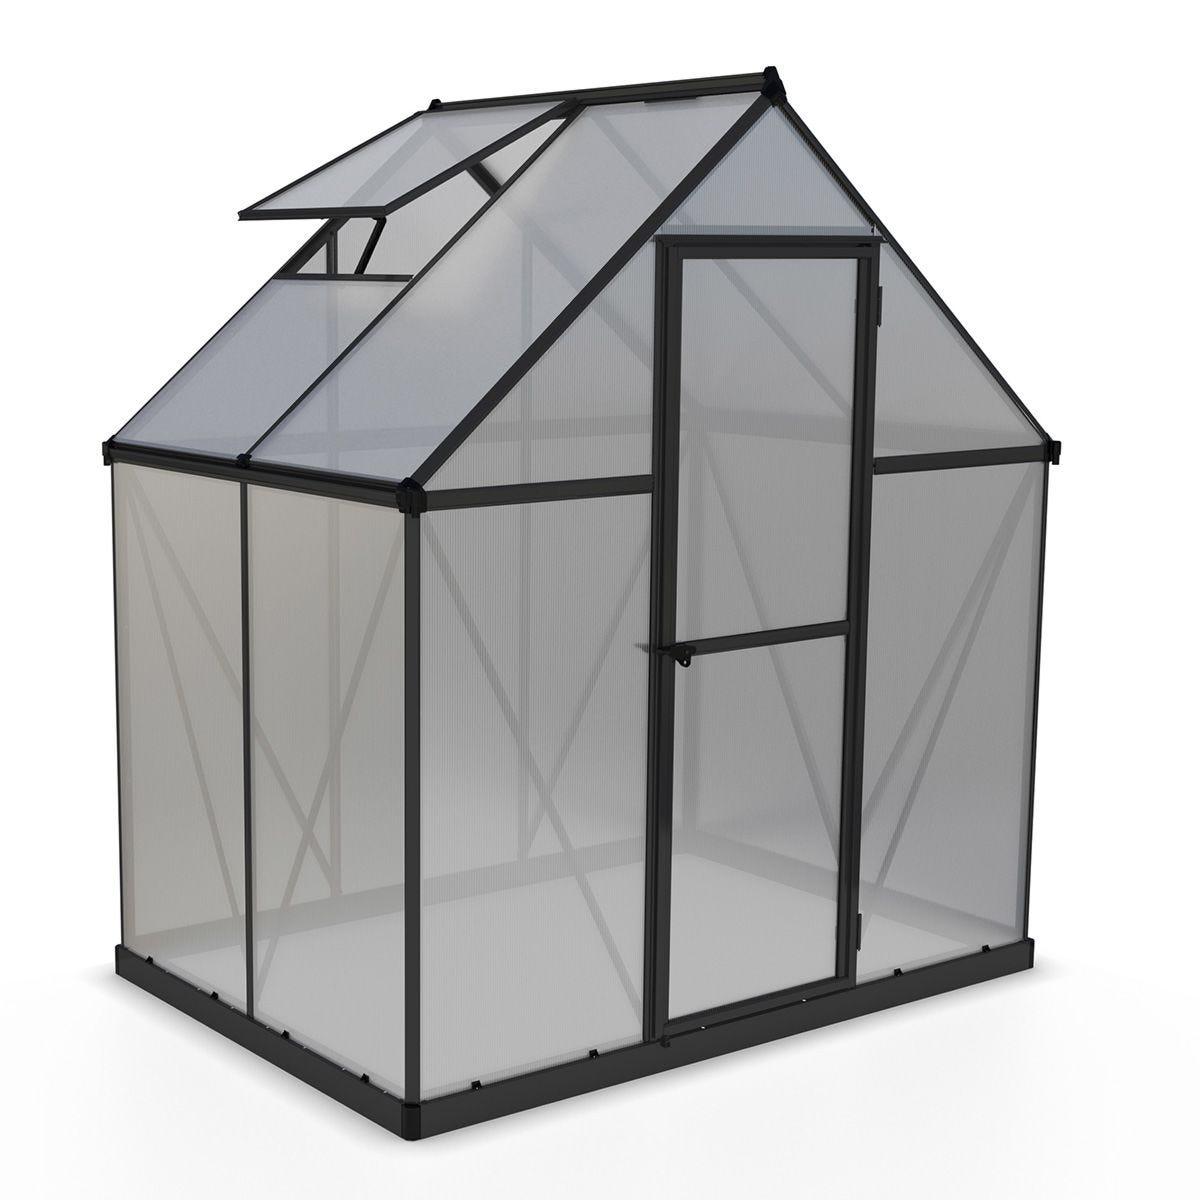 Palram Mythos Greenhouse Grey - 6 x 4